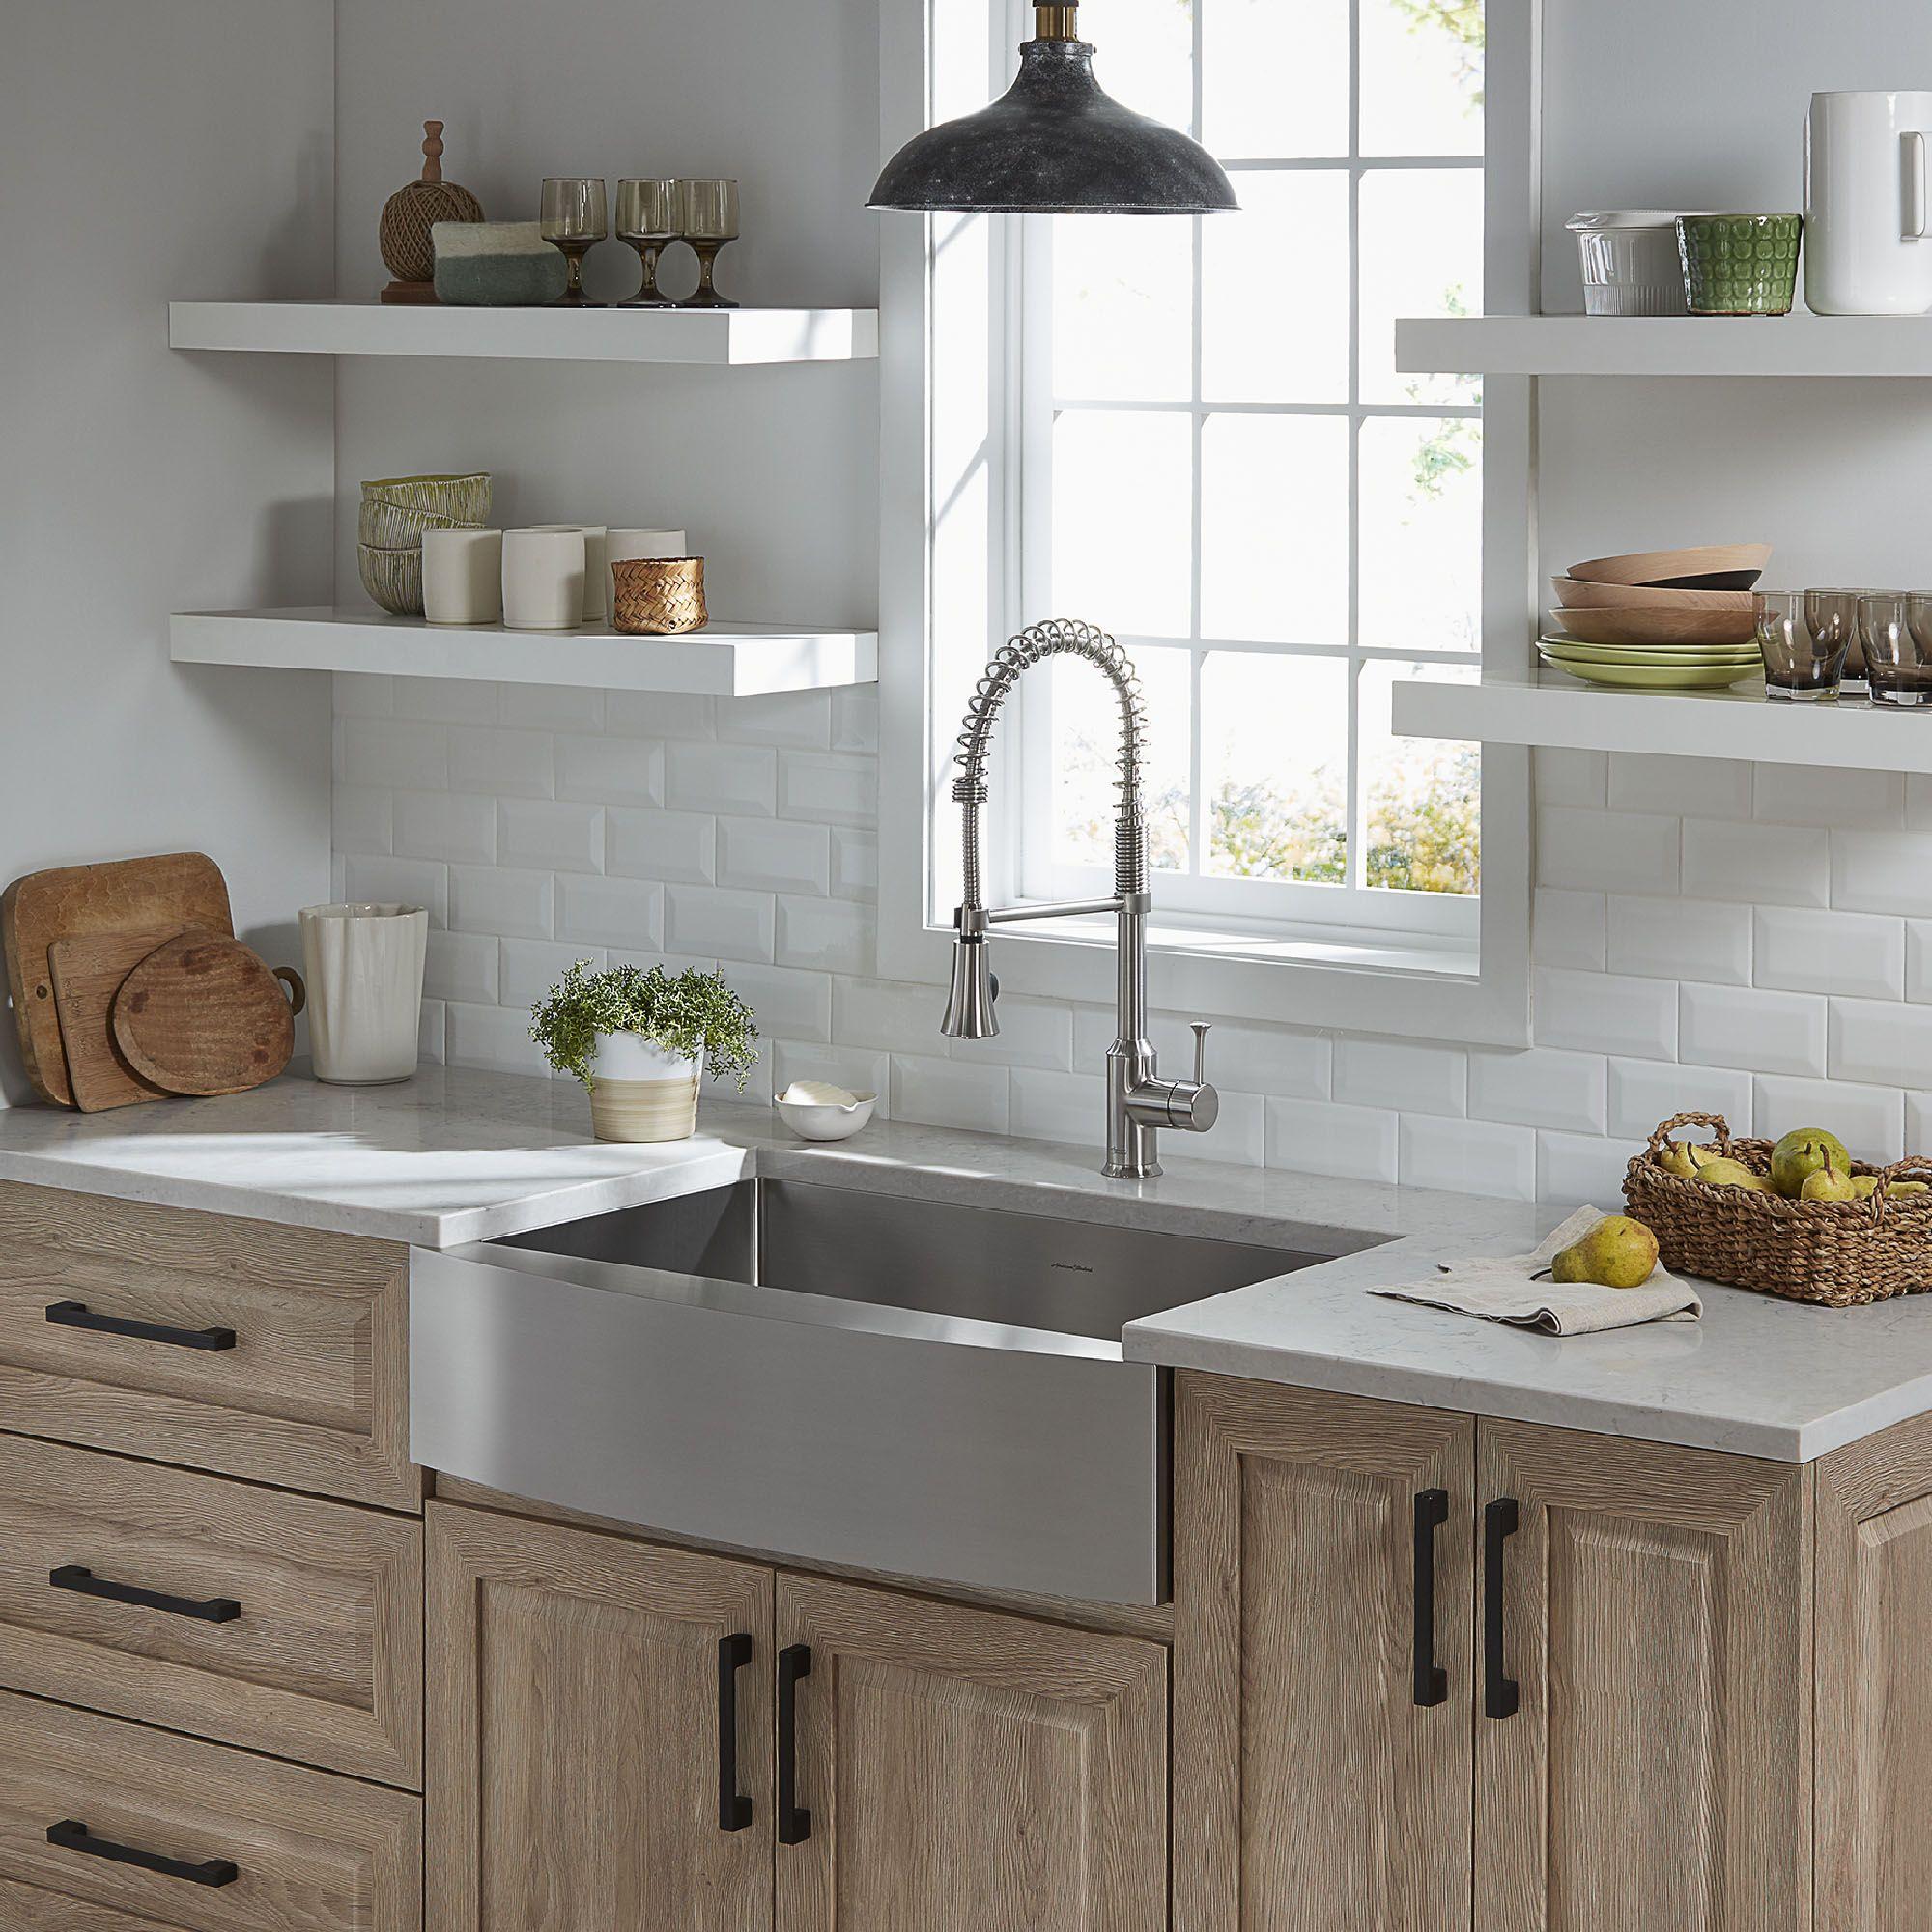 Pekoe 33x22 Inch Stainless Steel Apron Sink Single Bowl Kitchen